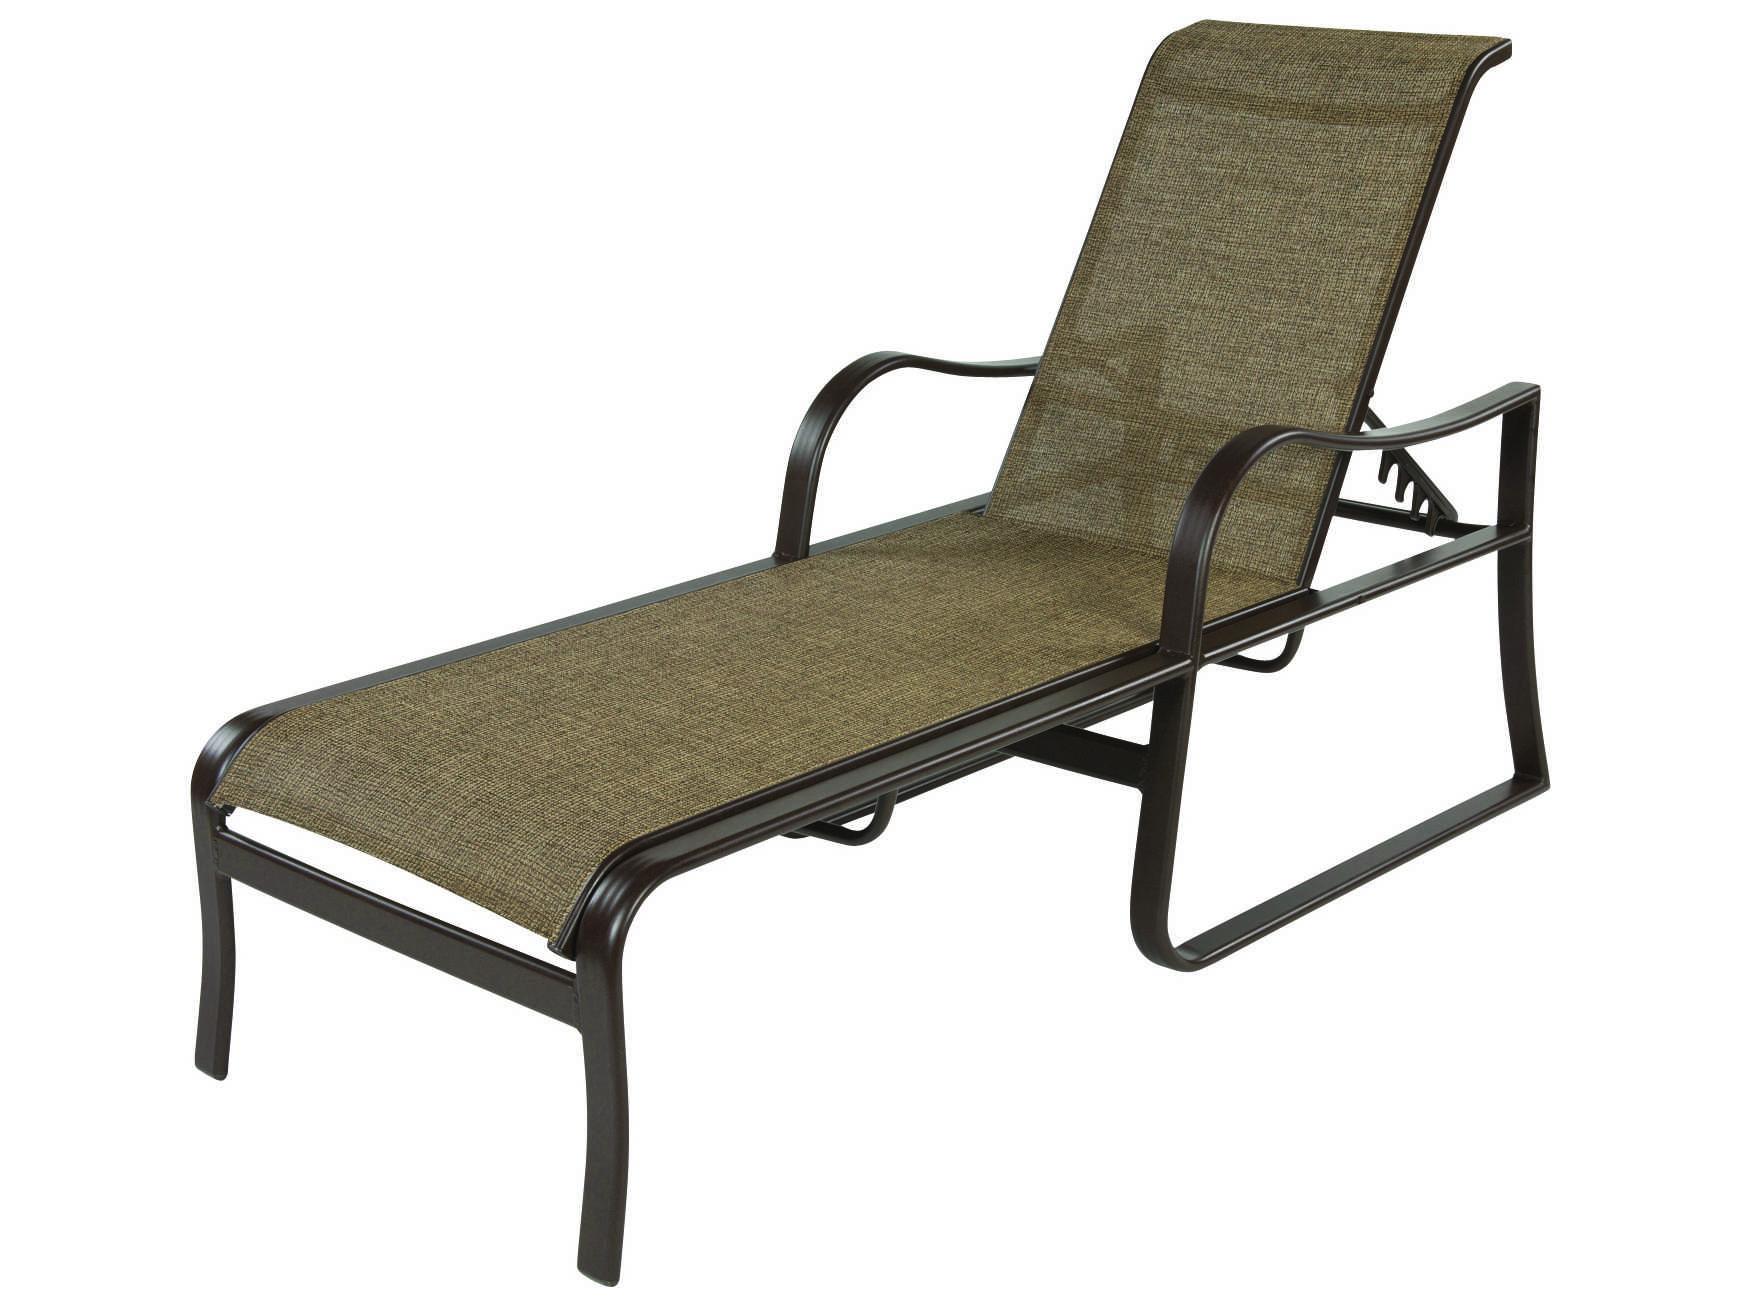 Windward design group corsica sling aluminum chaise lounge for Aluminum sling chaise lounge